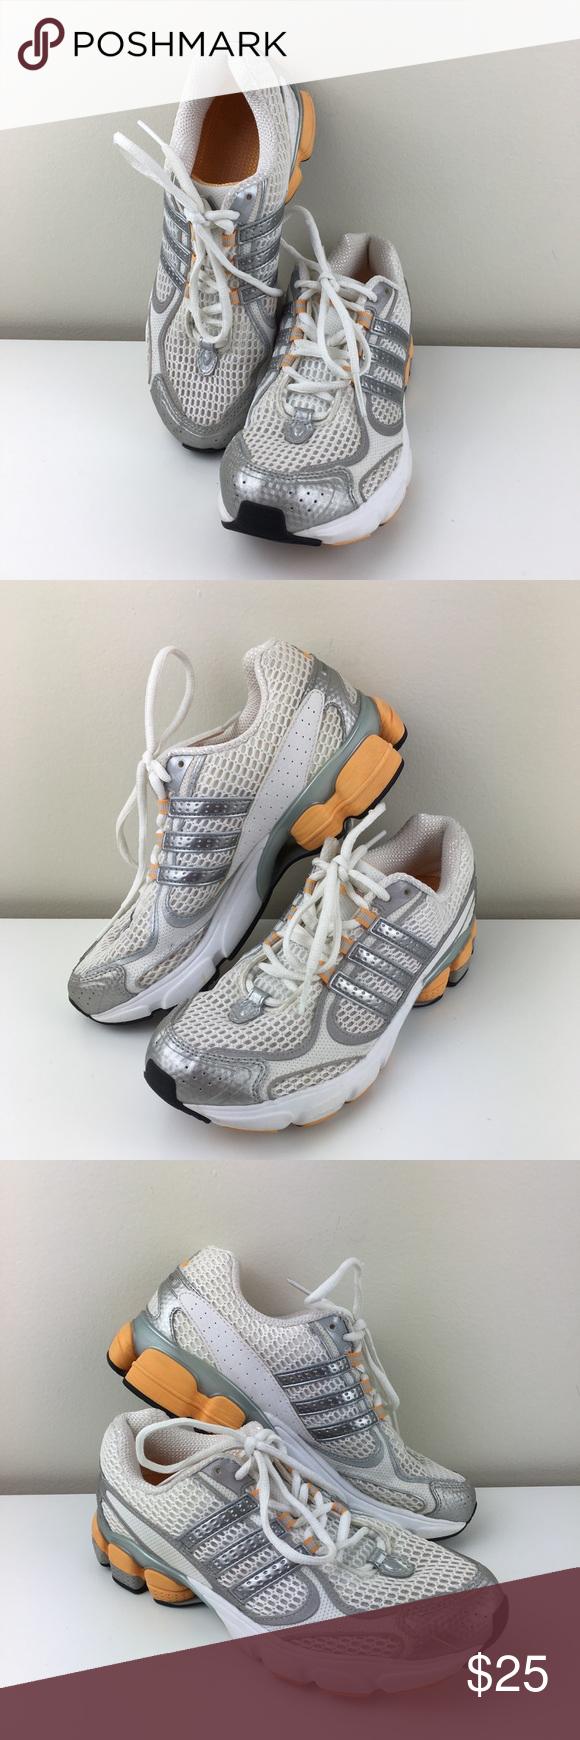 Sz7 Yya trainingsschoenen Ladies Adidas Runningcross 606001 1U884q